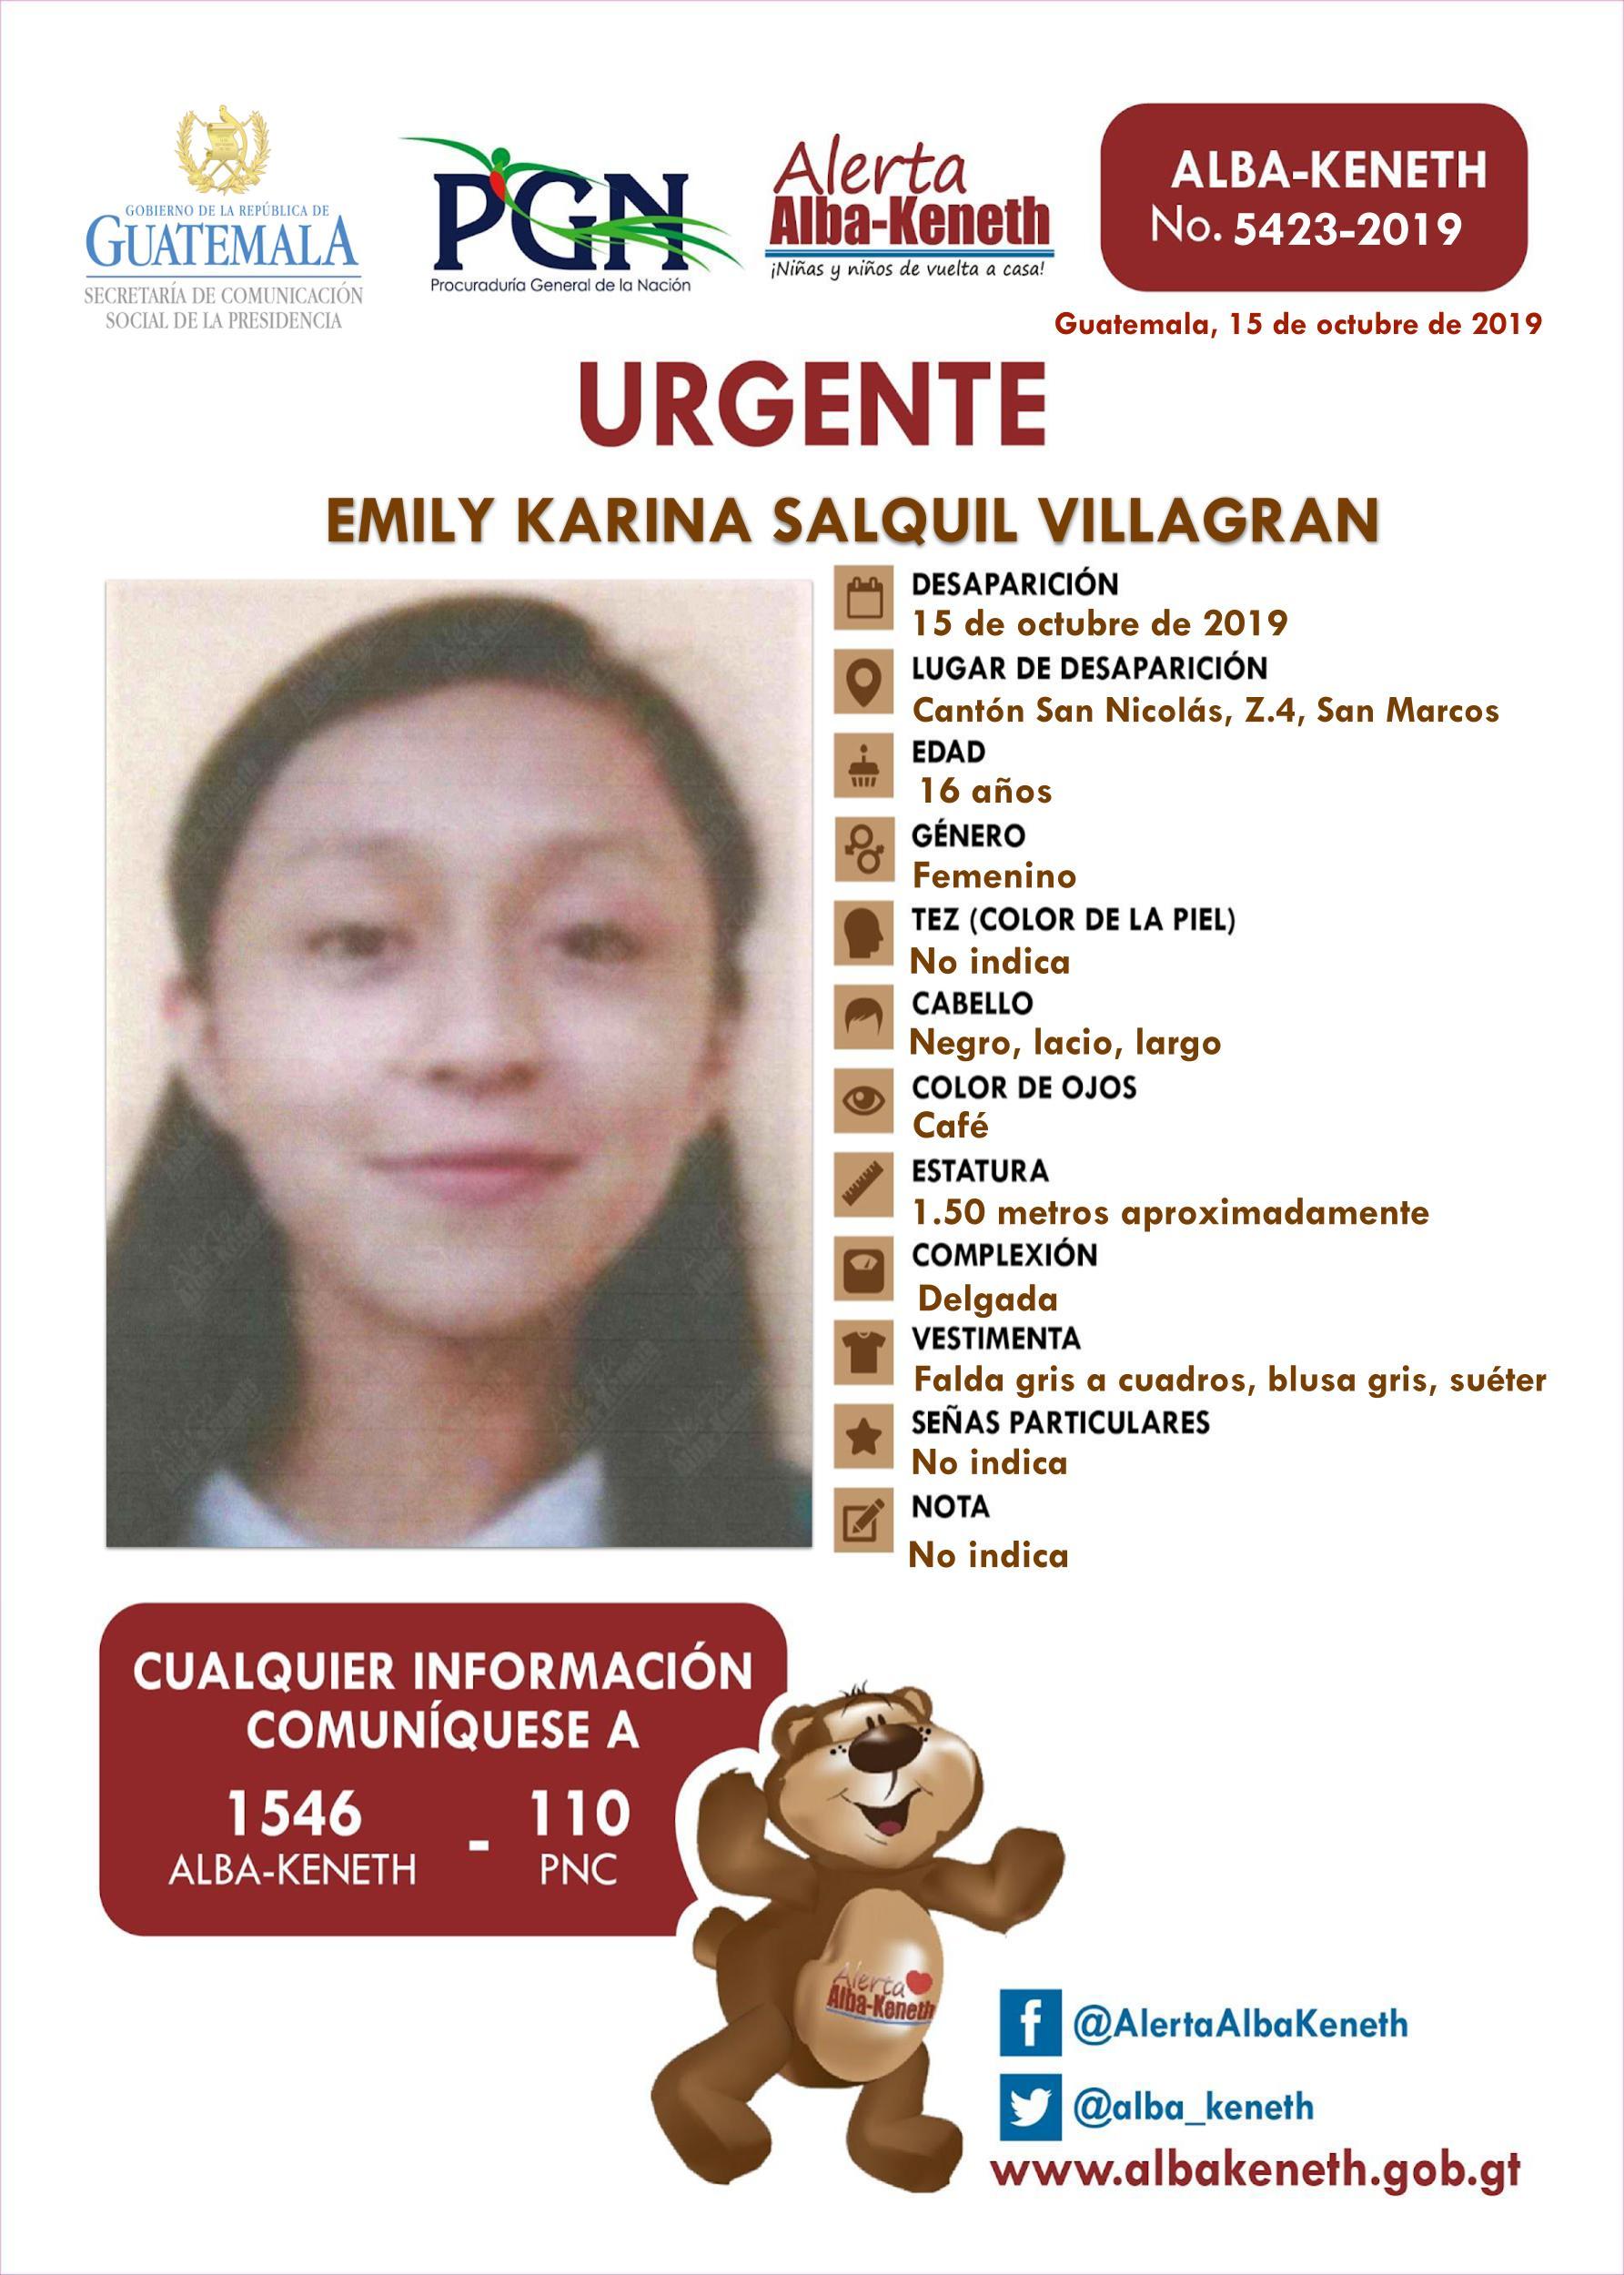 Emily Karina Salquil Villagran